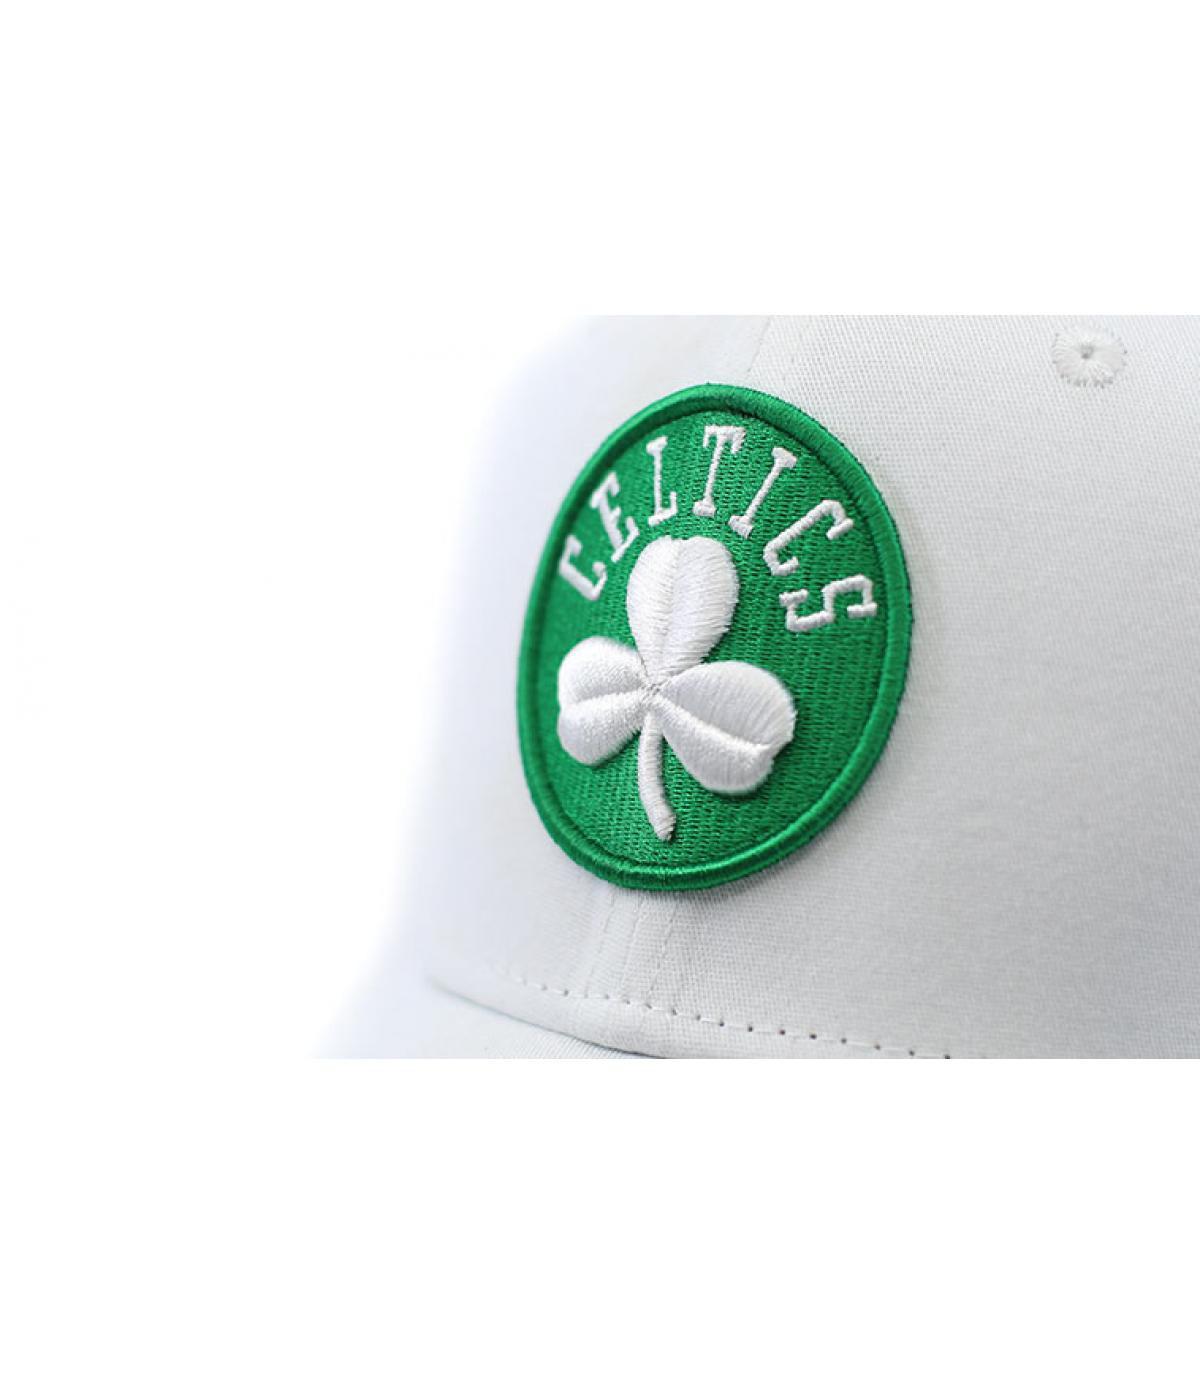 Detalles Stretch Snap 9Fifty Celtics imagen 3